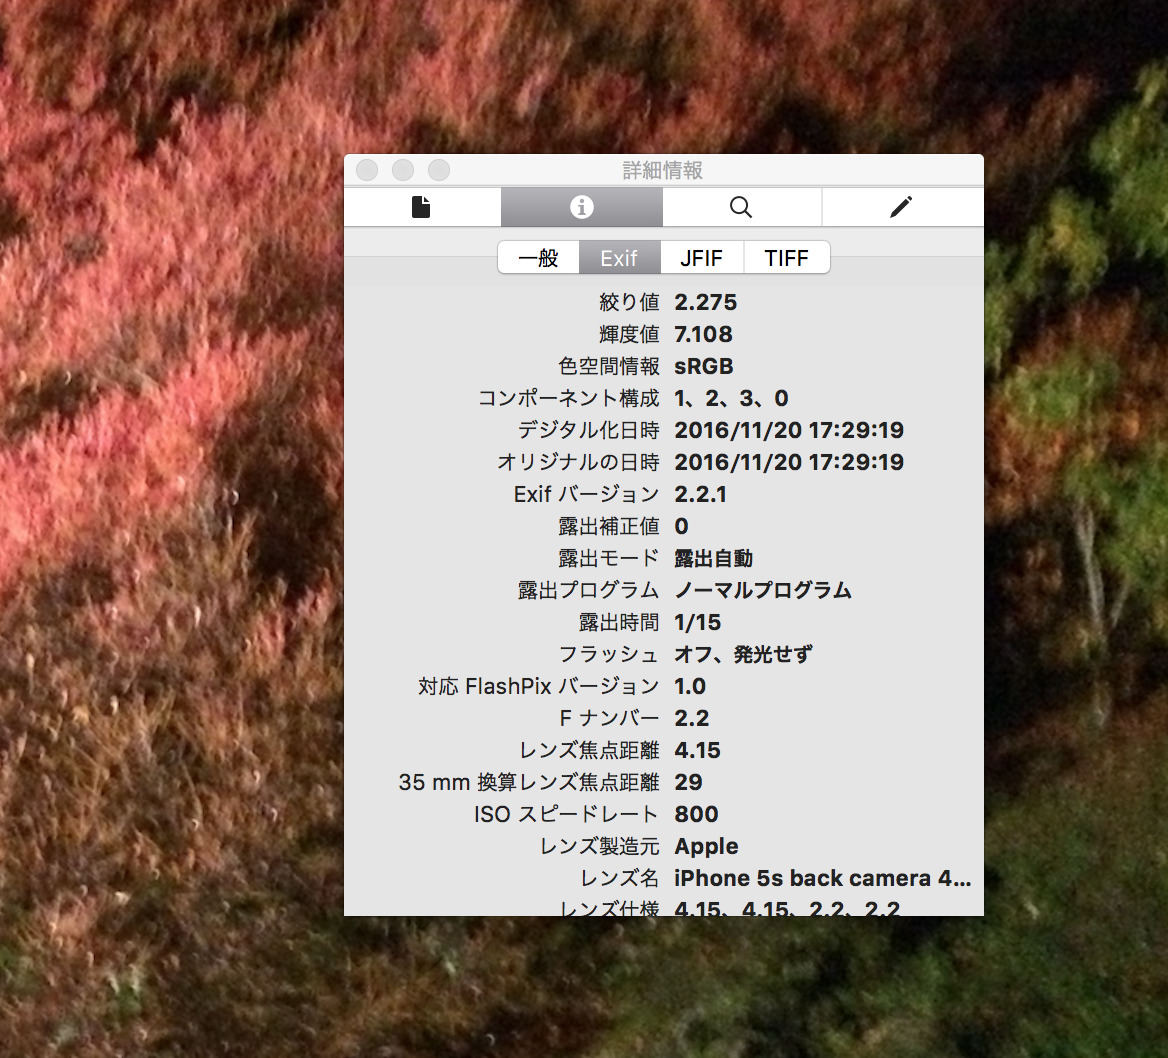 f:id:takuya_1st:20161206153455j:plain:w300